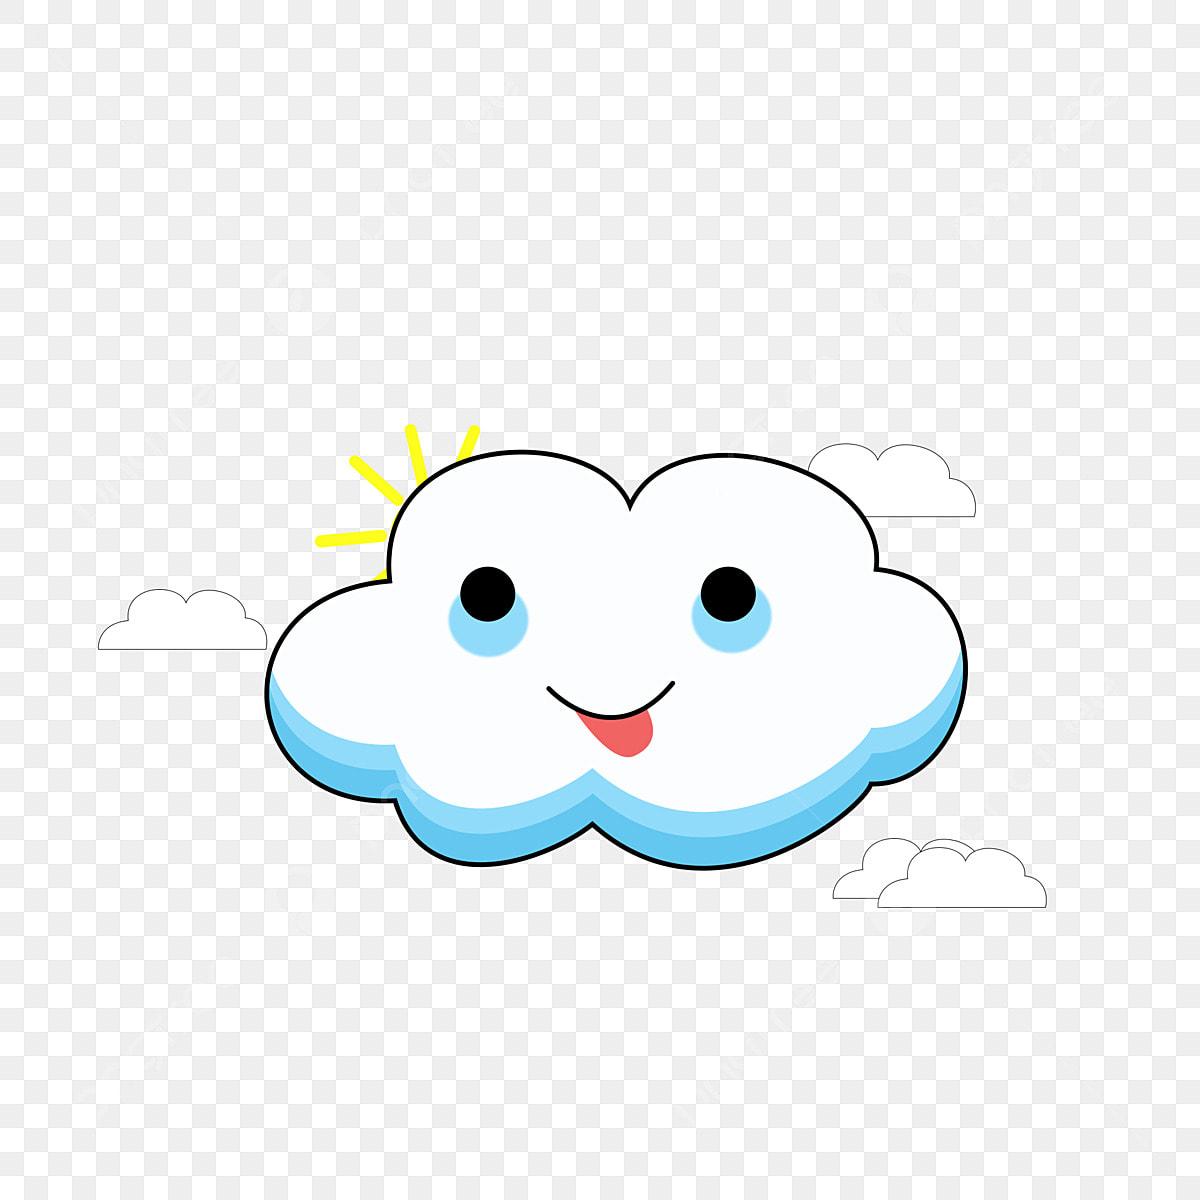 Commercial Cute Smiley Cartoon White Cloud Cartoon White Clouds